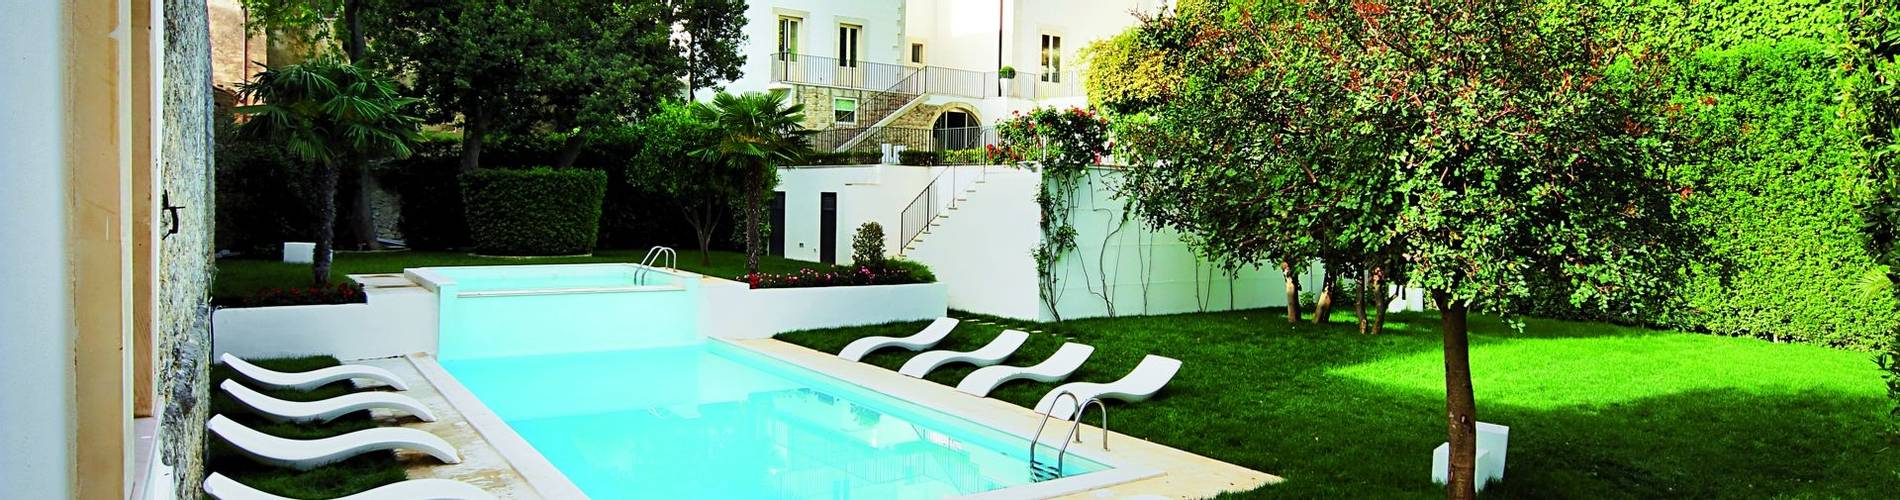 Villa Del Lauro, Sicily, Italy (7).jpg